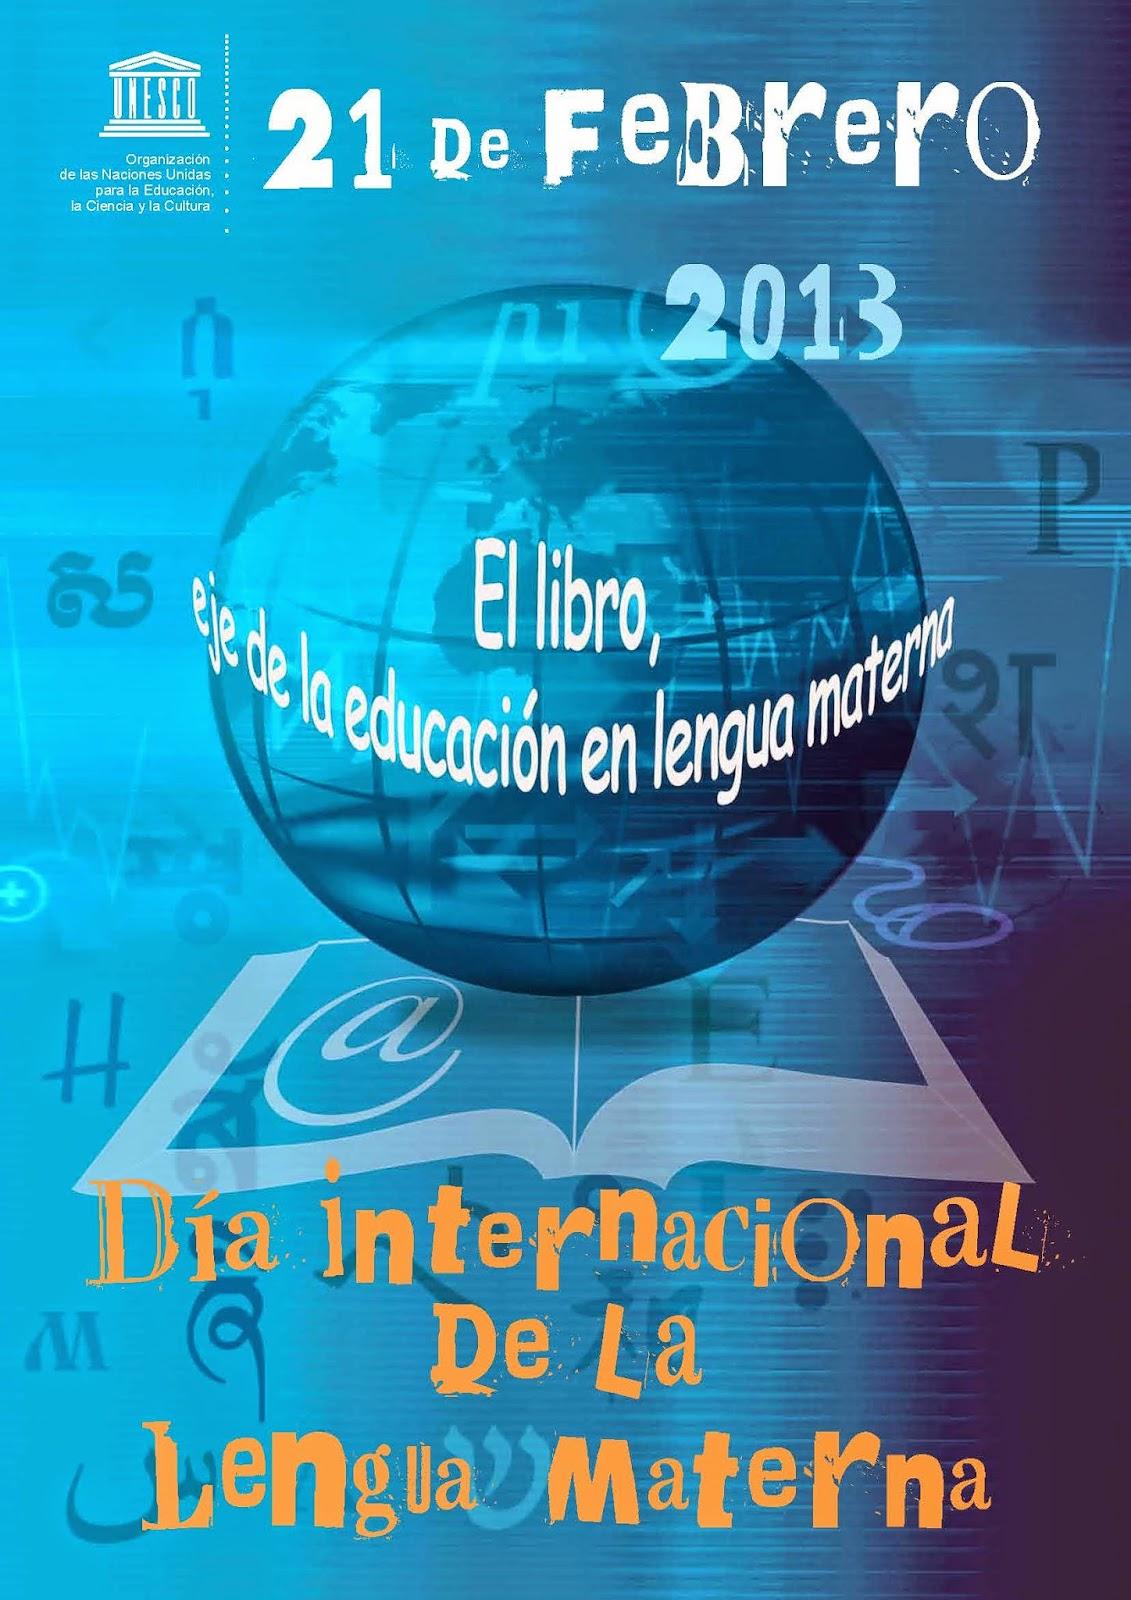 Afiche Día Internacional de la Lengua Materna 2013 - UNESCO